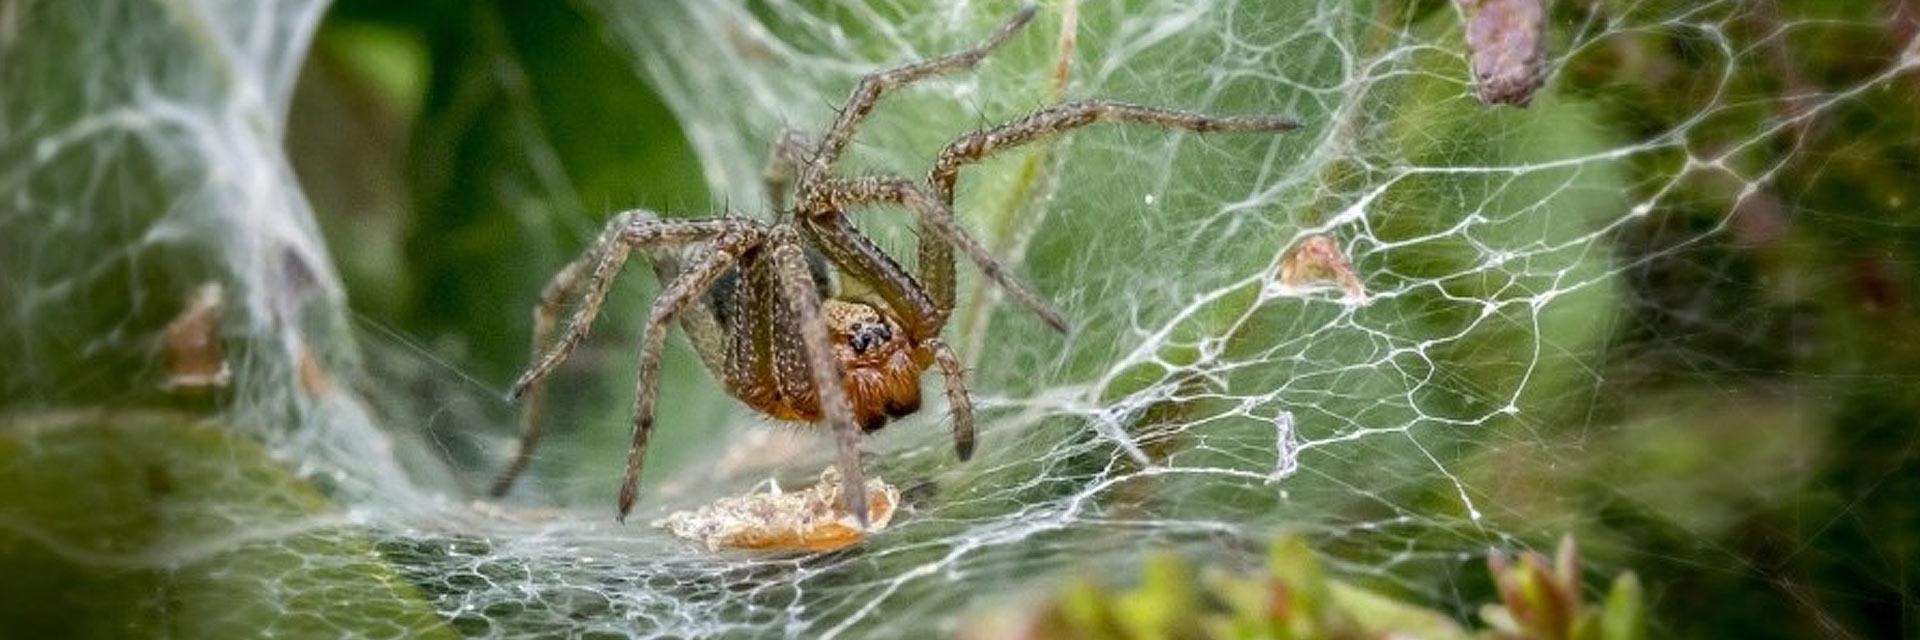 Corky's Spider Control Service